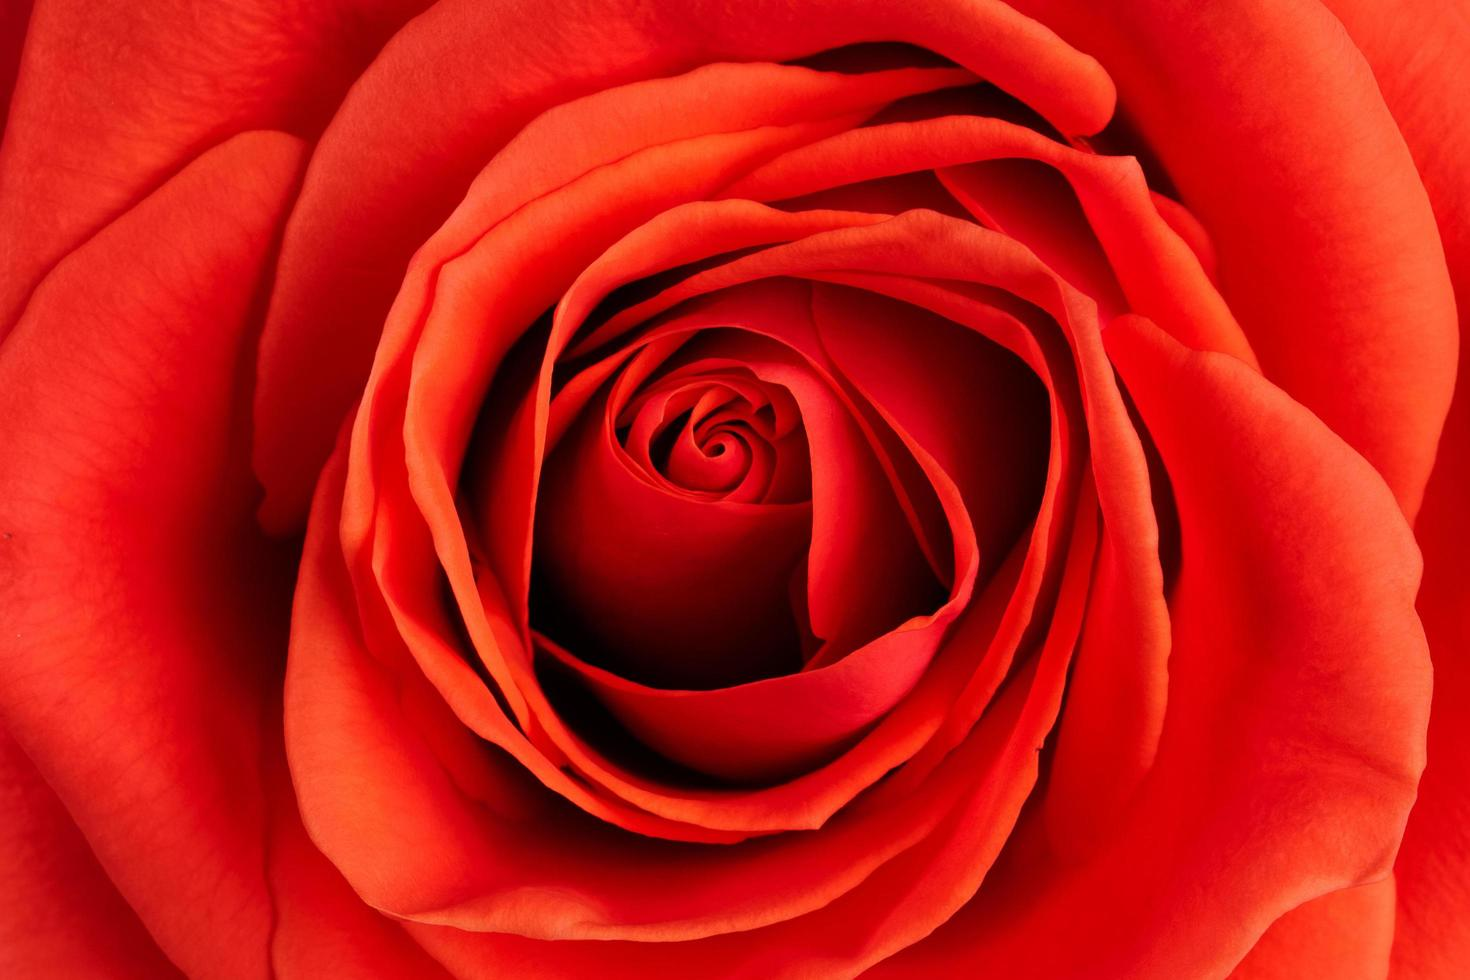 fond de rose écarlate fraîche photo